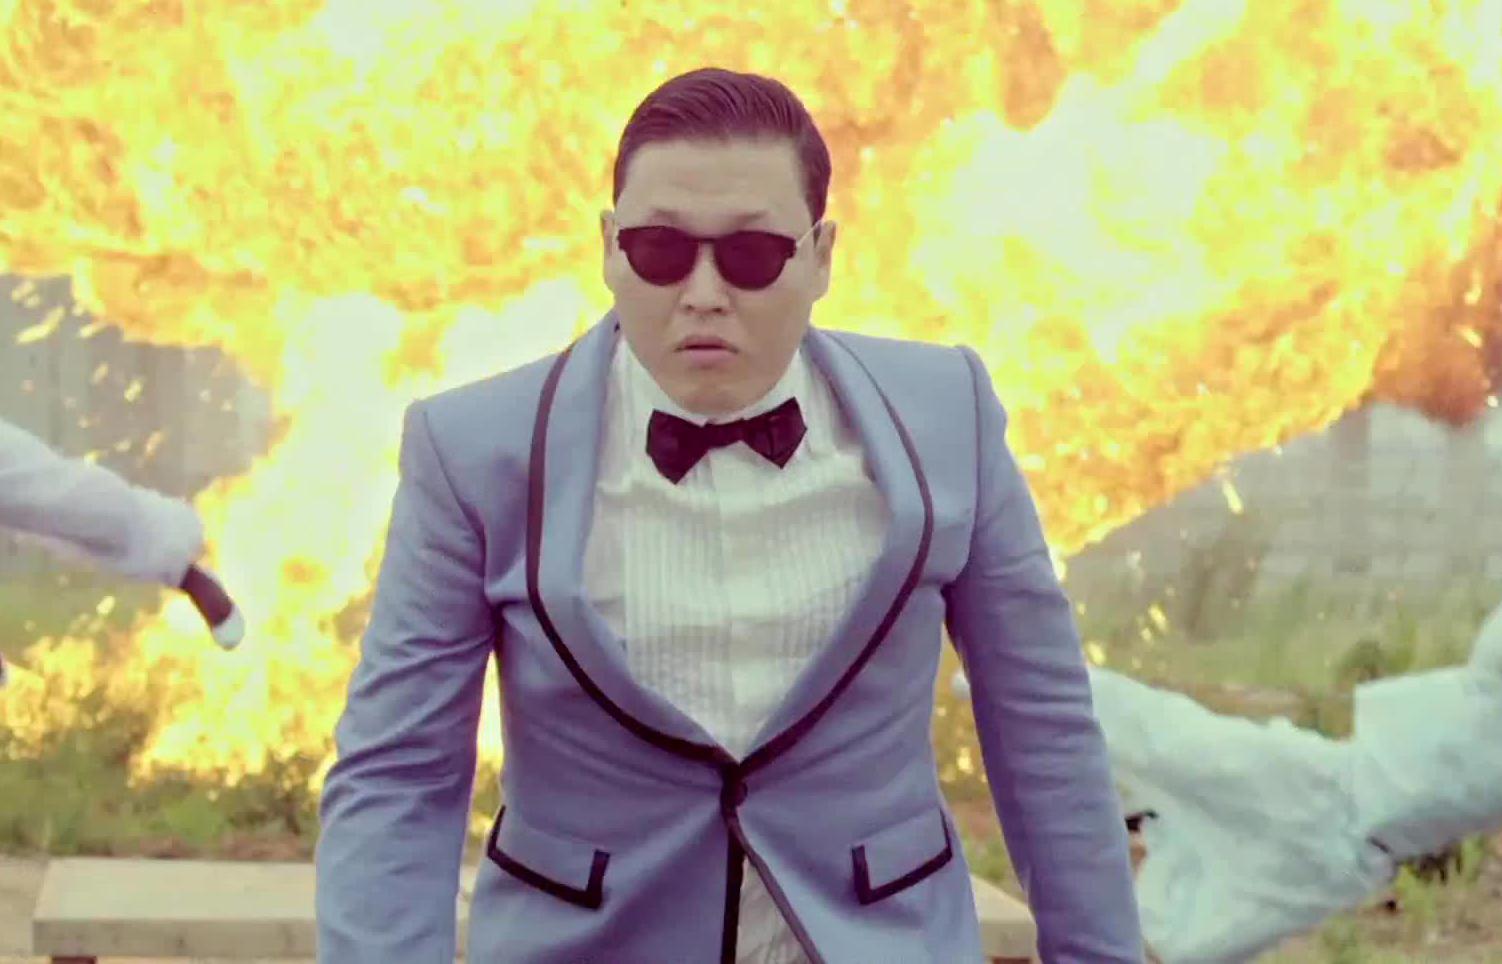 PSY Gangnam Style HD MP3 Download Celeb Family 1502x964